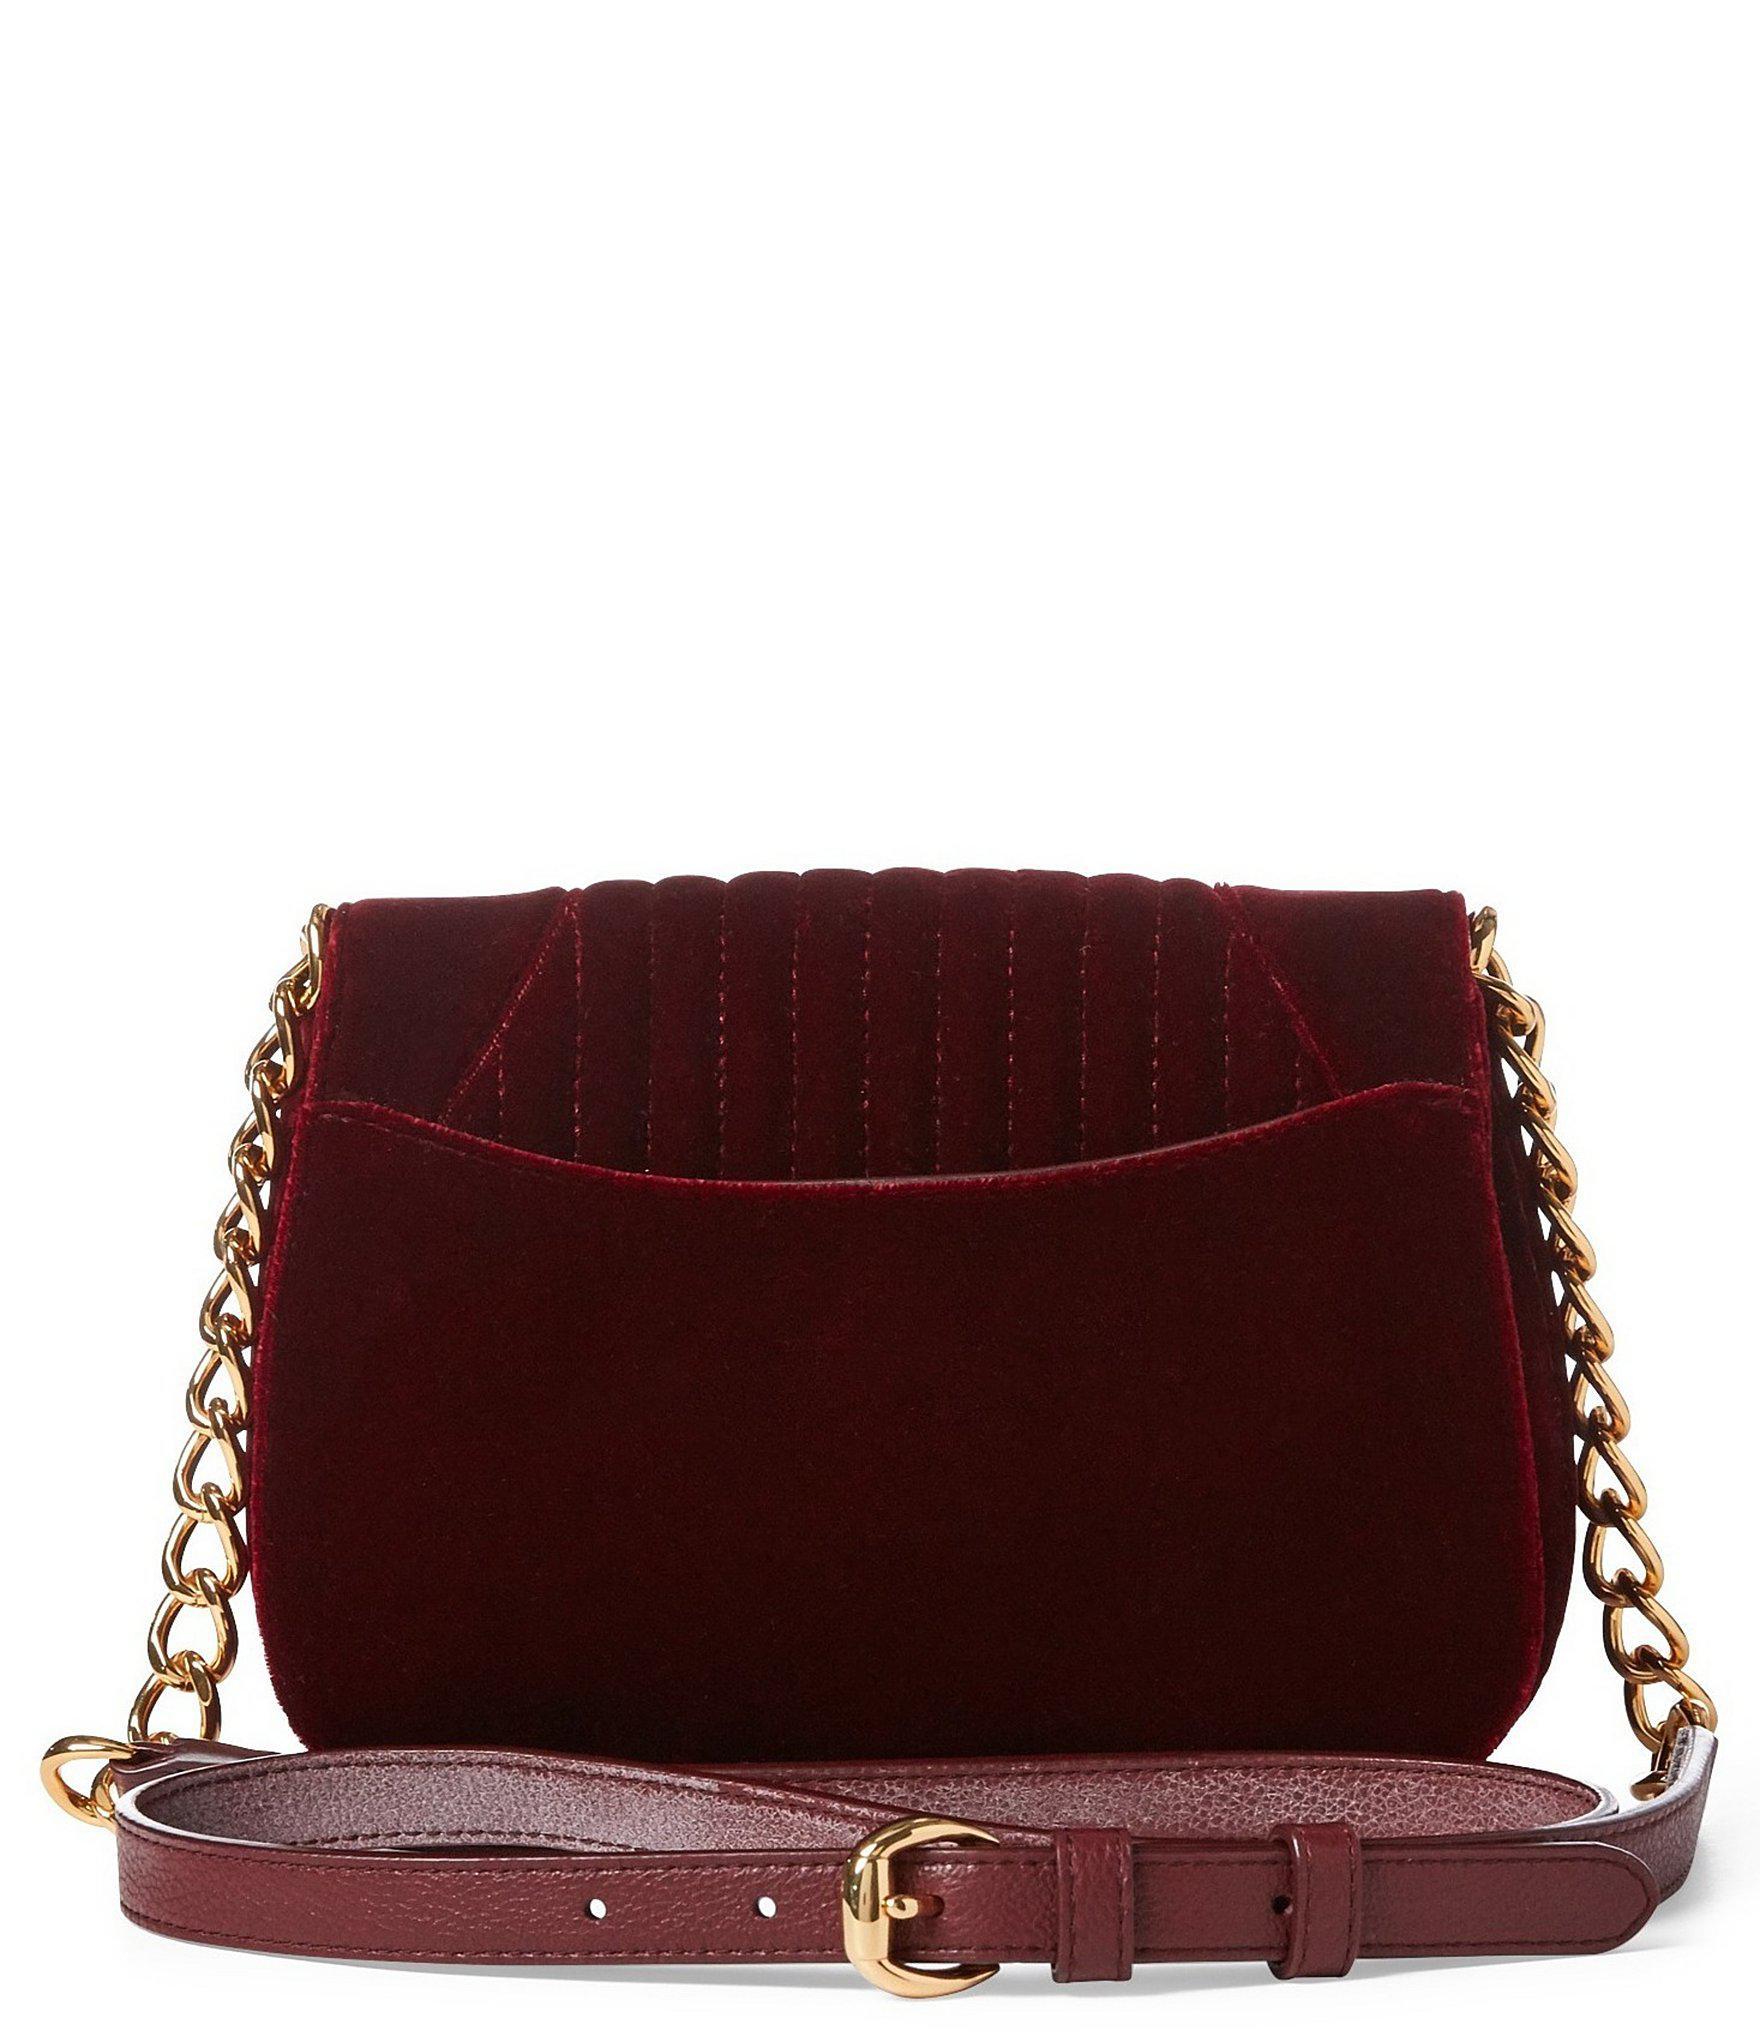 Lauren by Ralph Lauren - Purple Velvet Cross-body Bag - Lyst. View  fullscreen e9baff6361